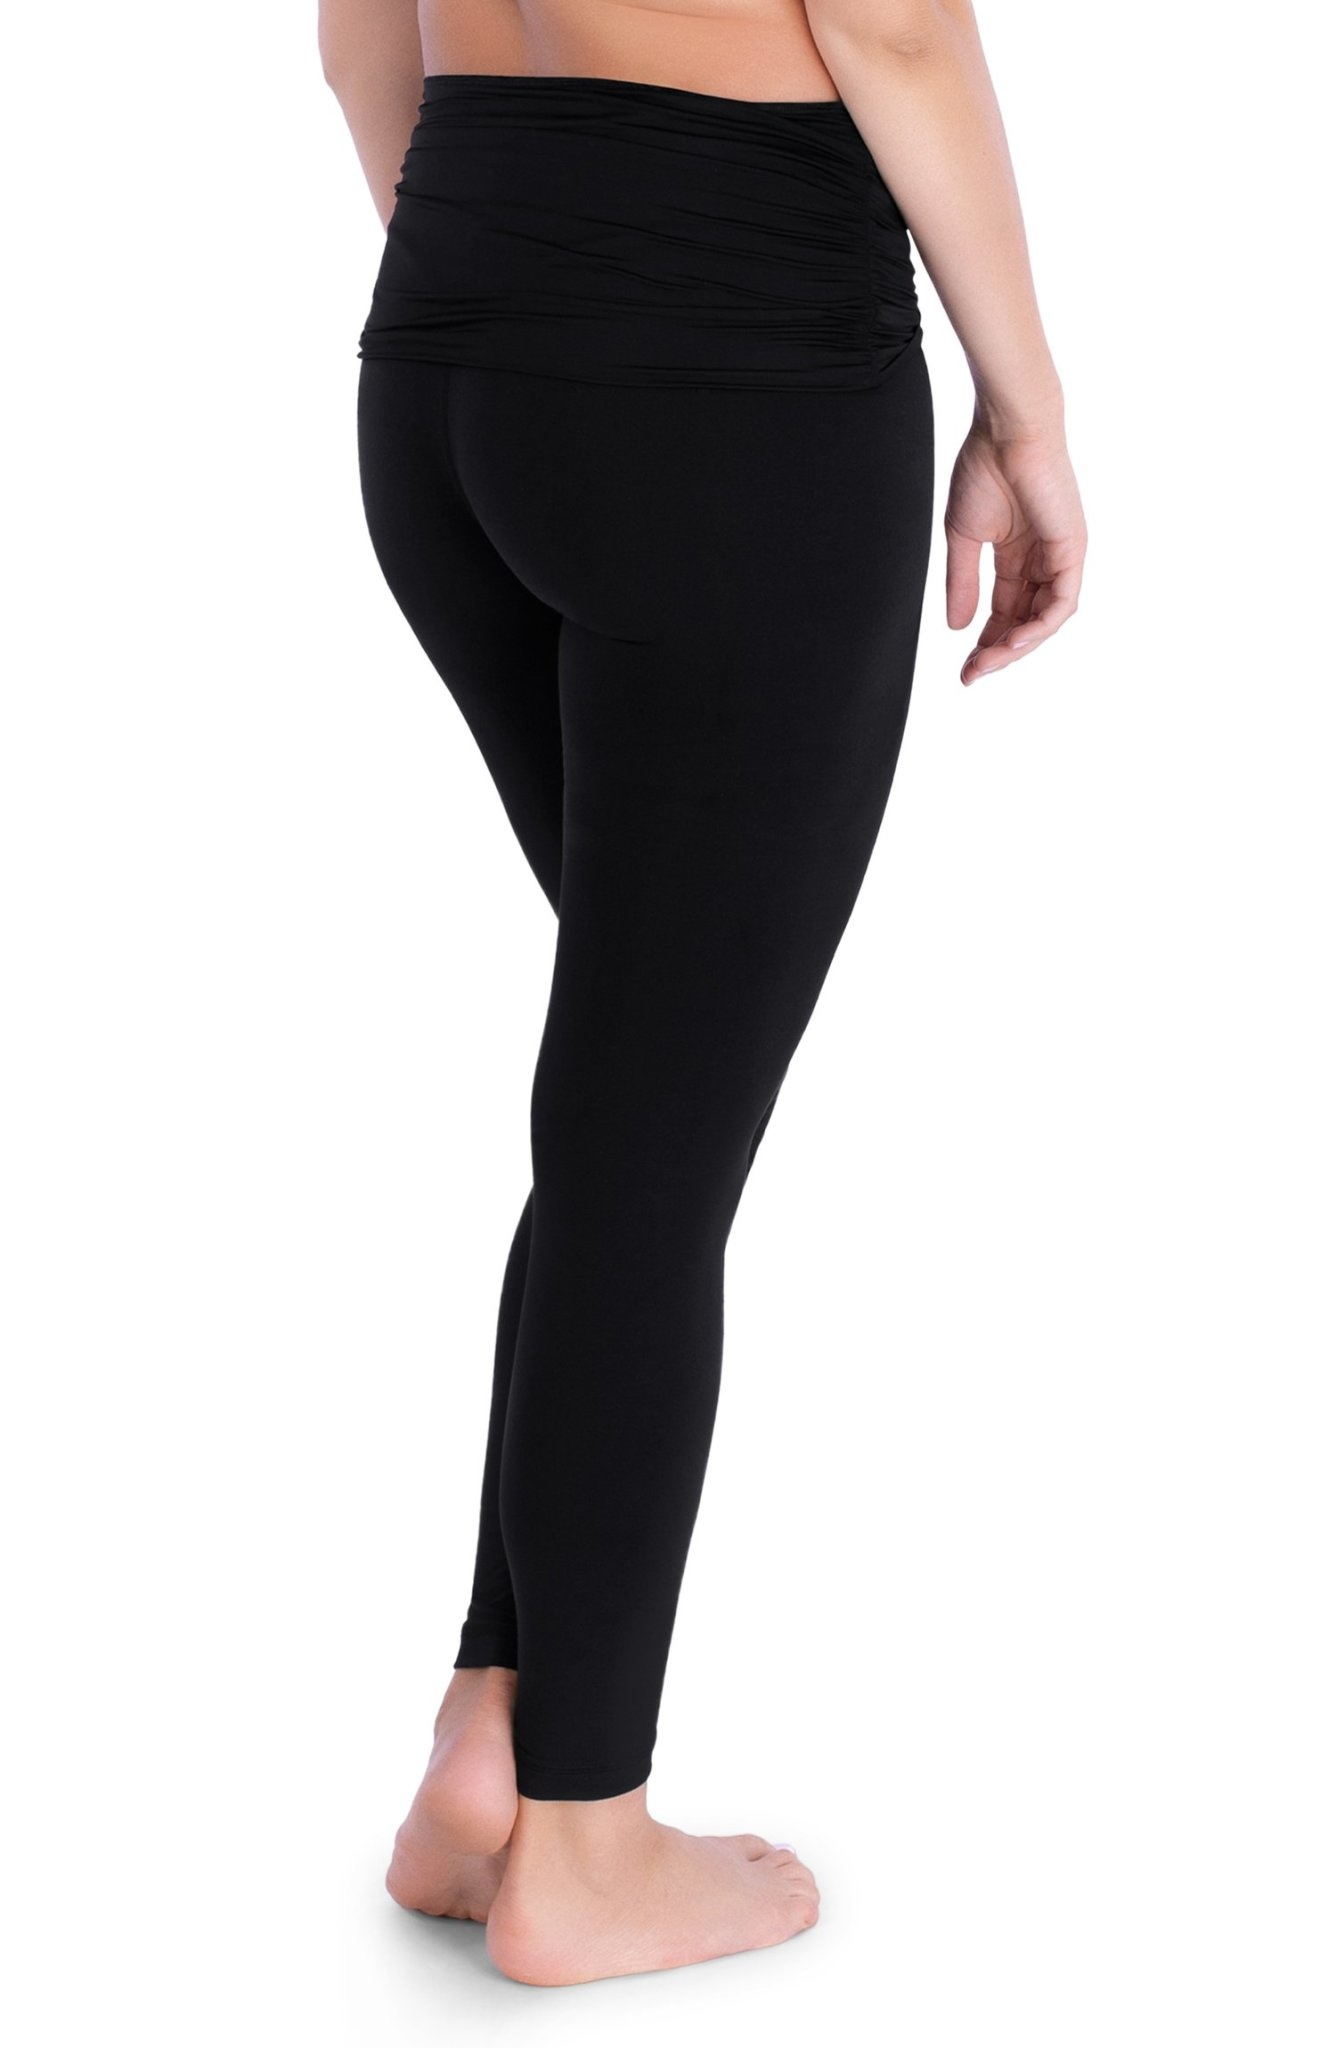 Belly Bandit Active Support Essential Leggings - Black